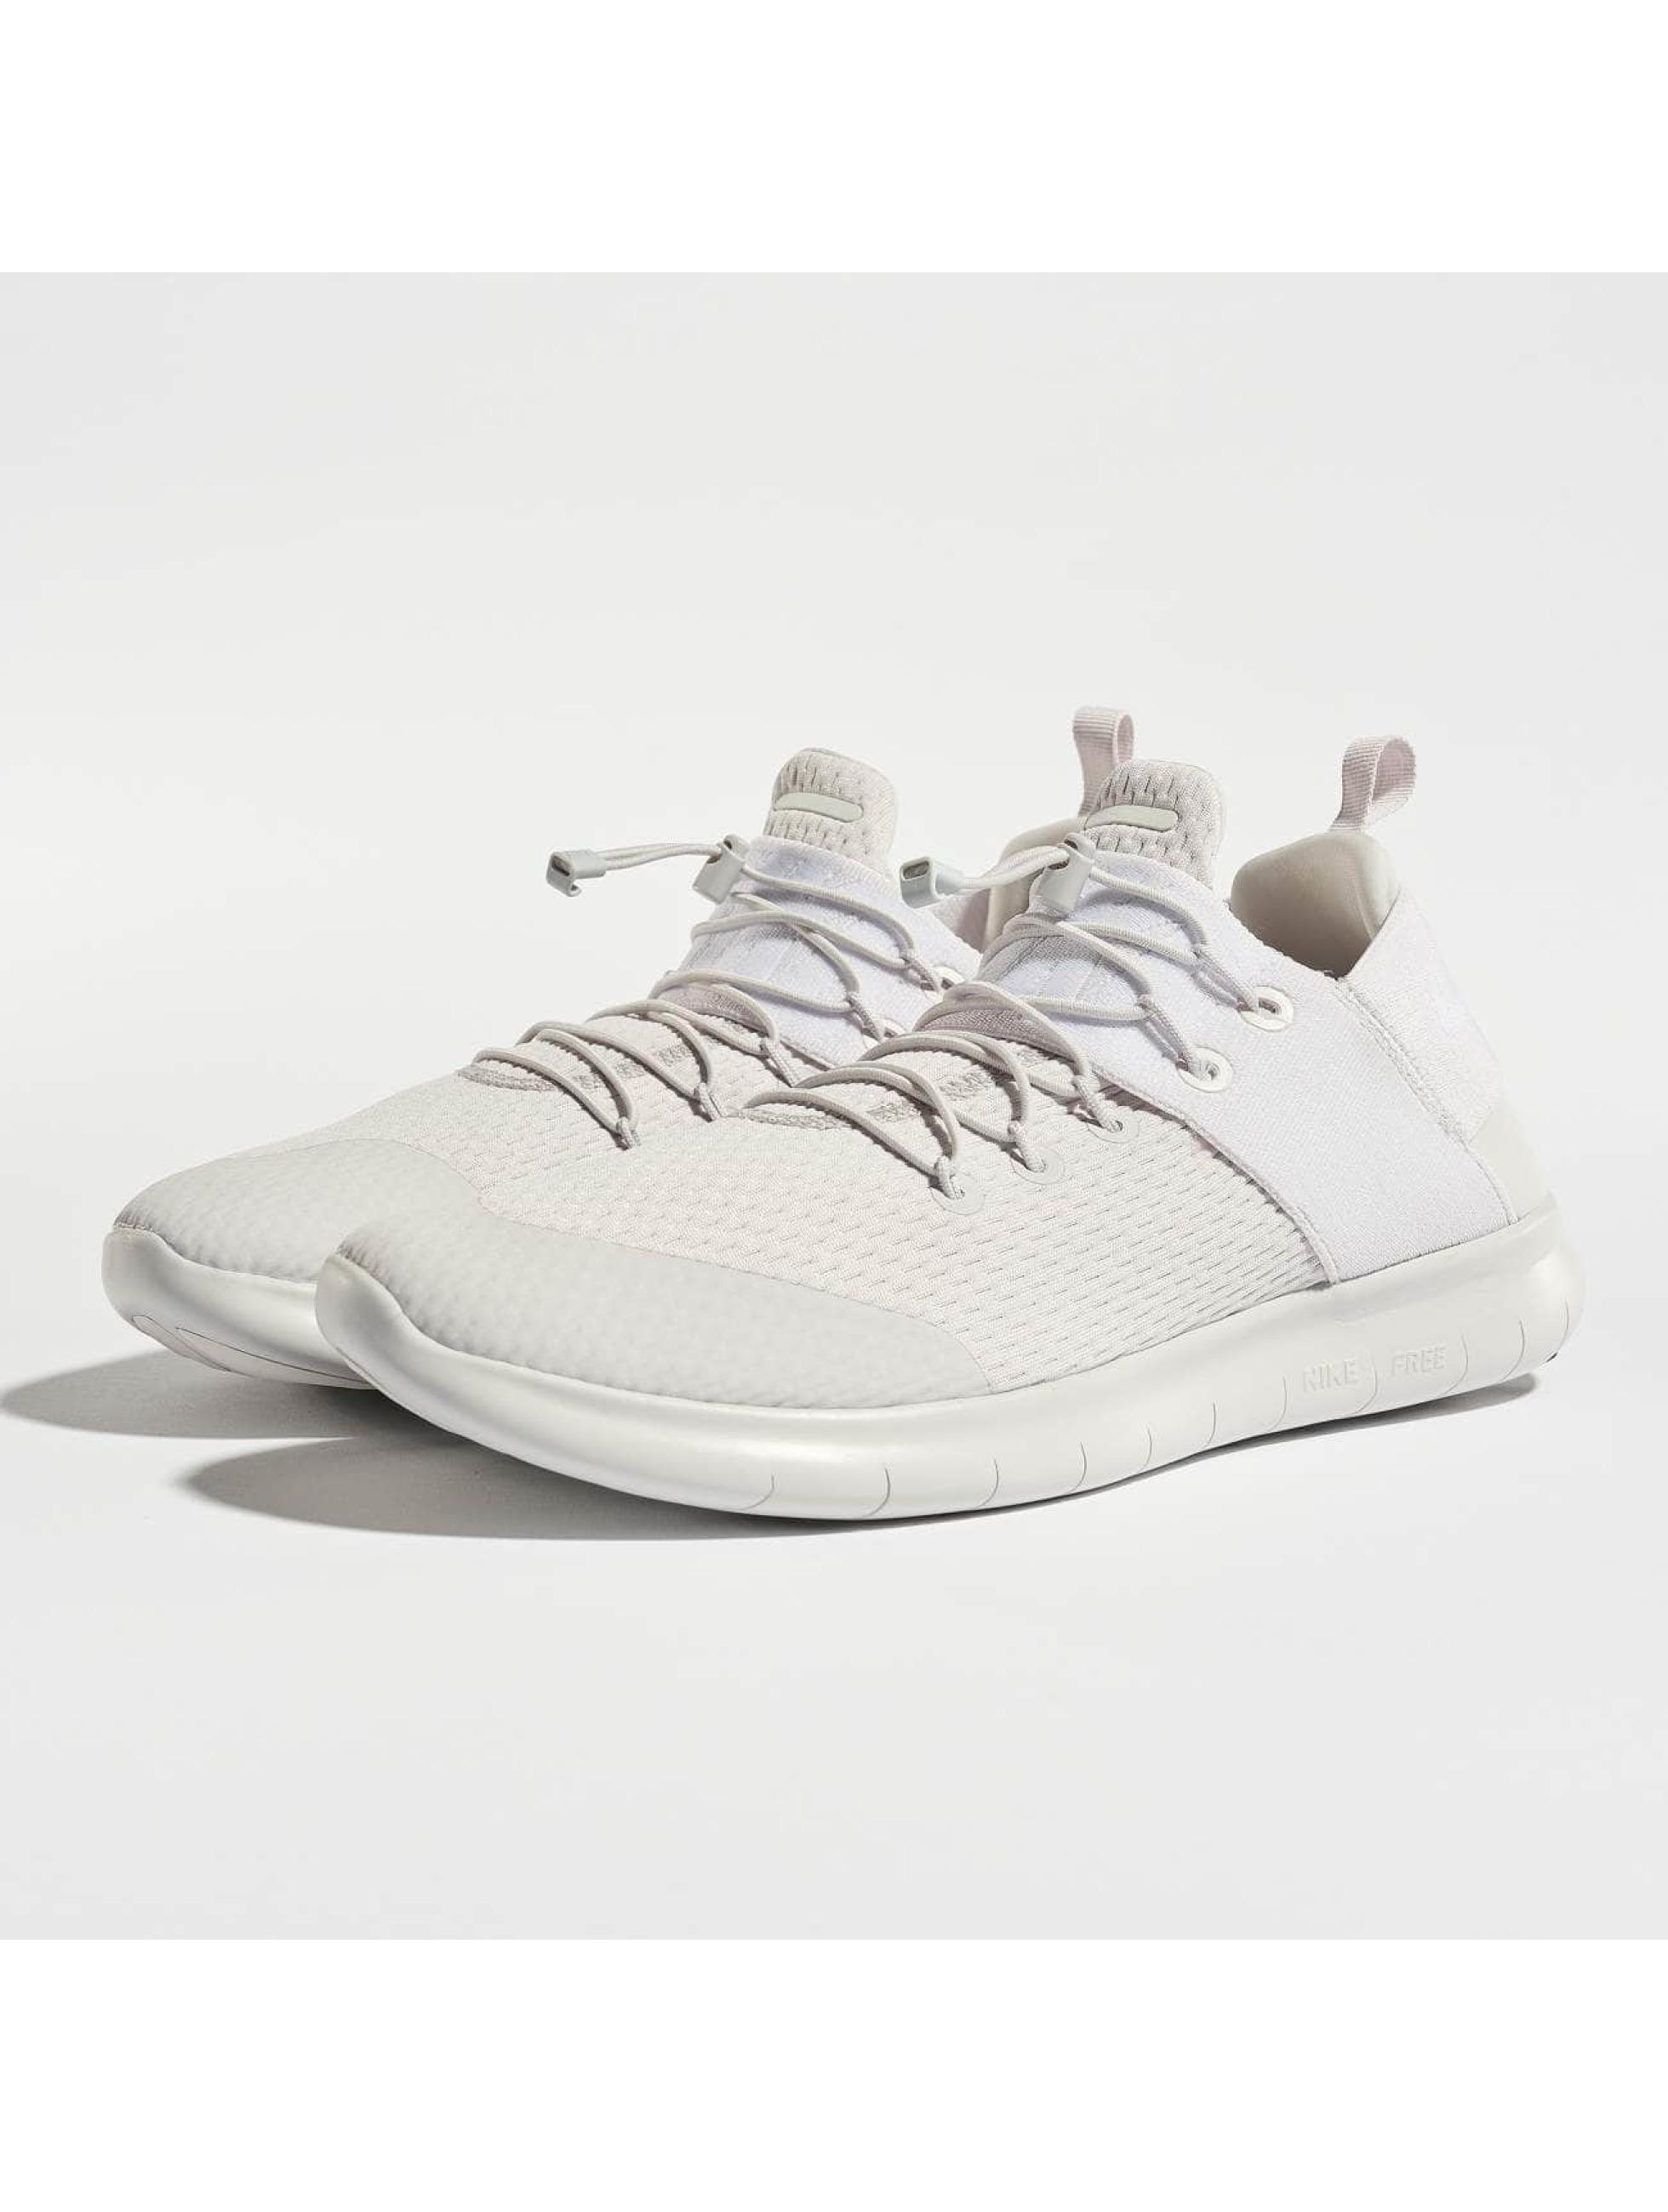 Nike Free RN Commuter 2017 Schuhe grau